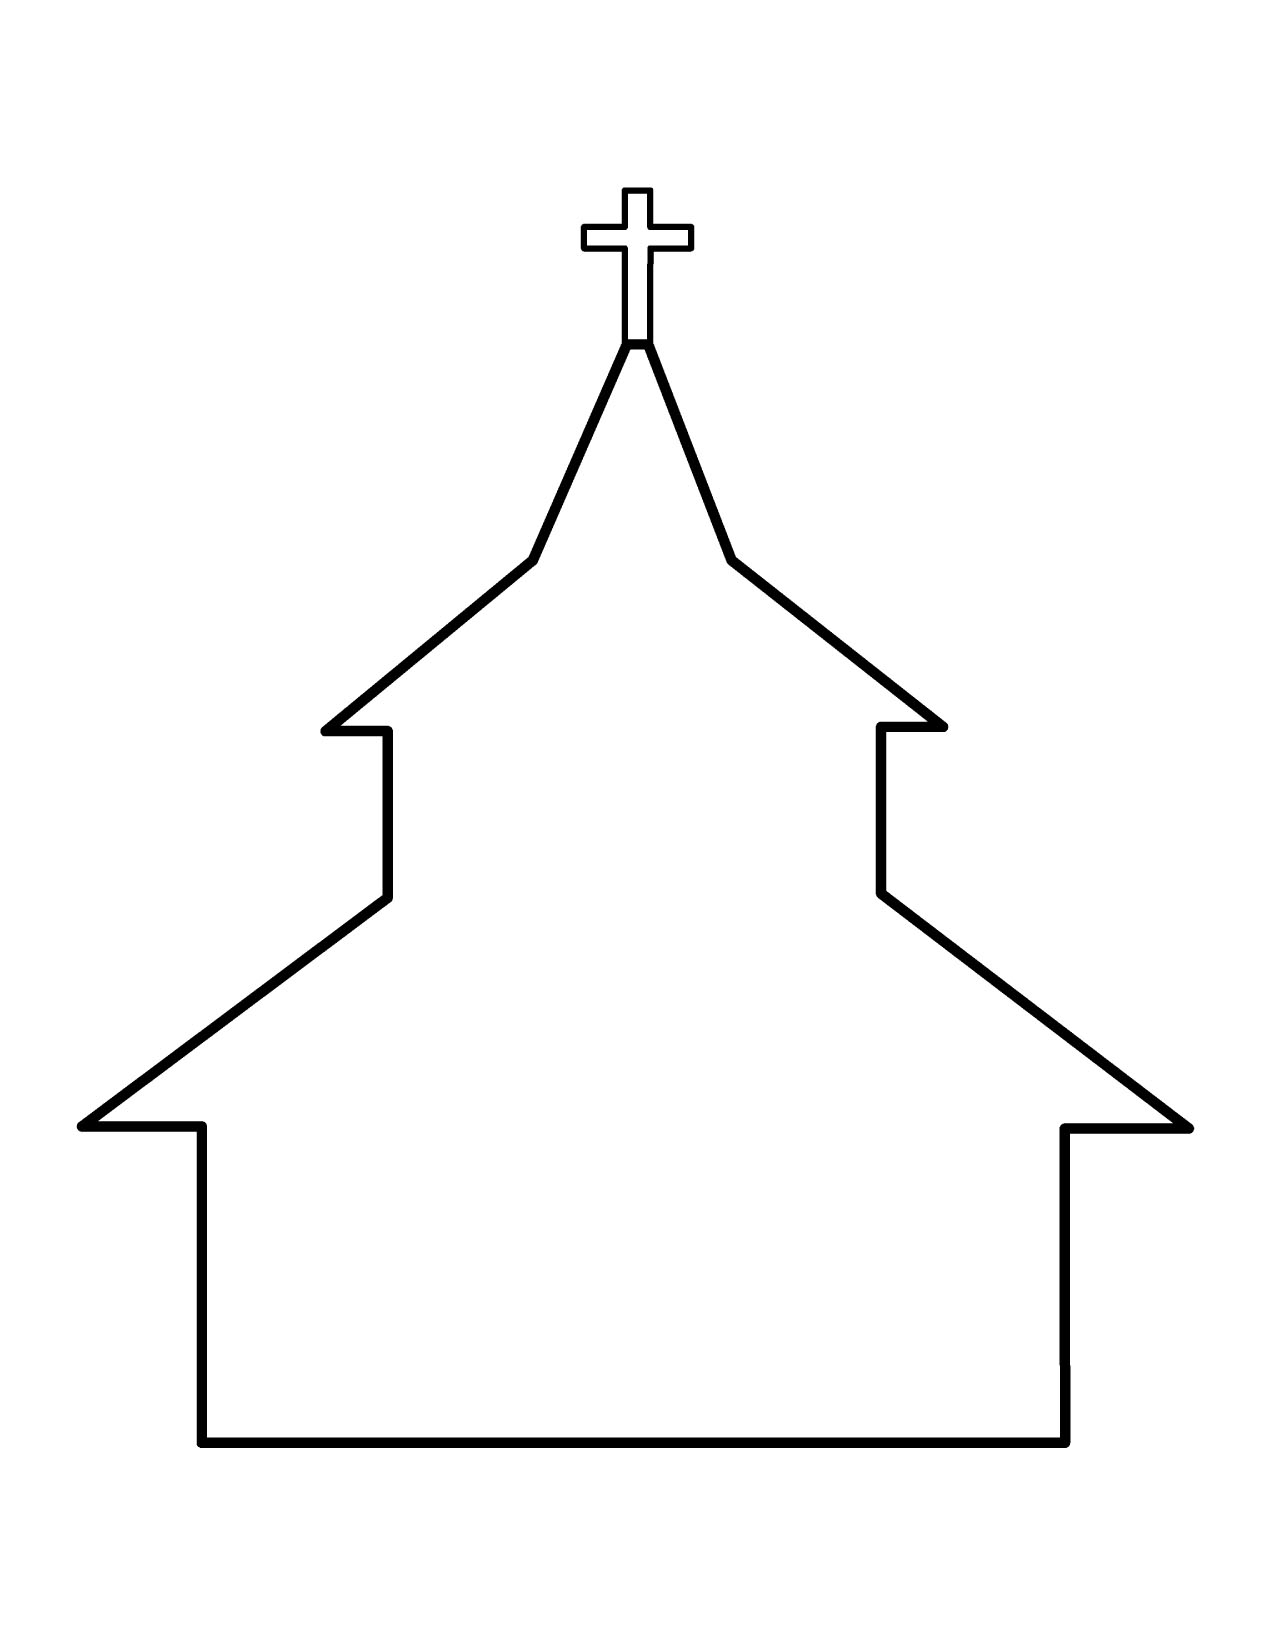 church building clip art clipart panda free clipart images rh clipartpanda com church building clipart images church building clipart free download